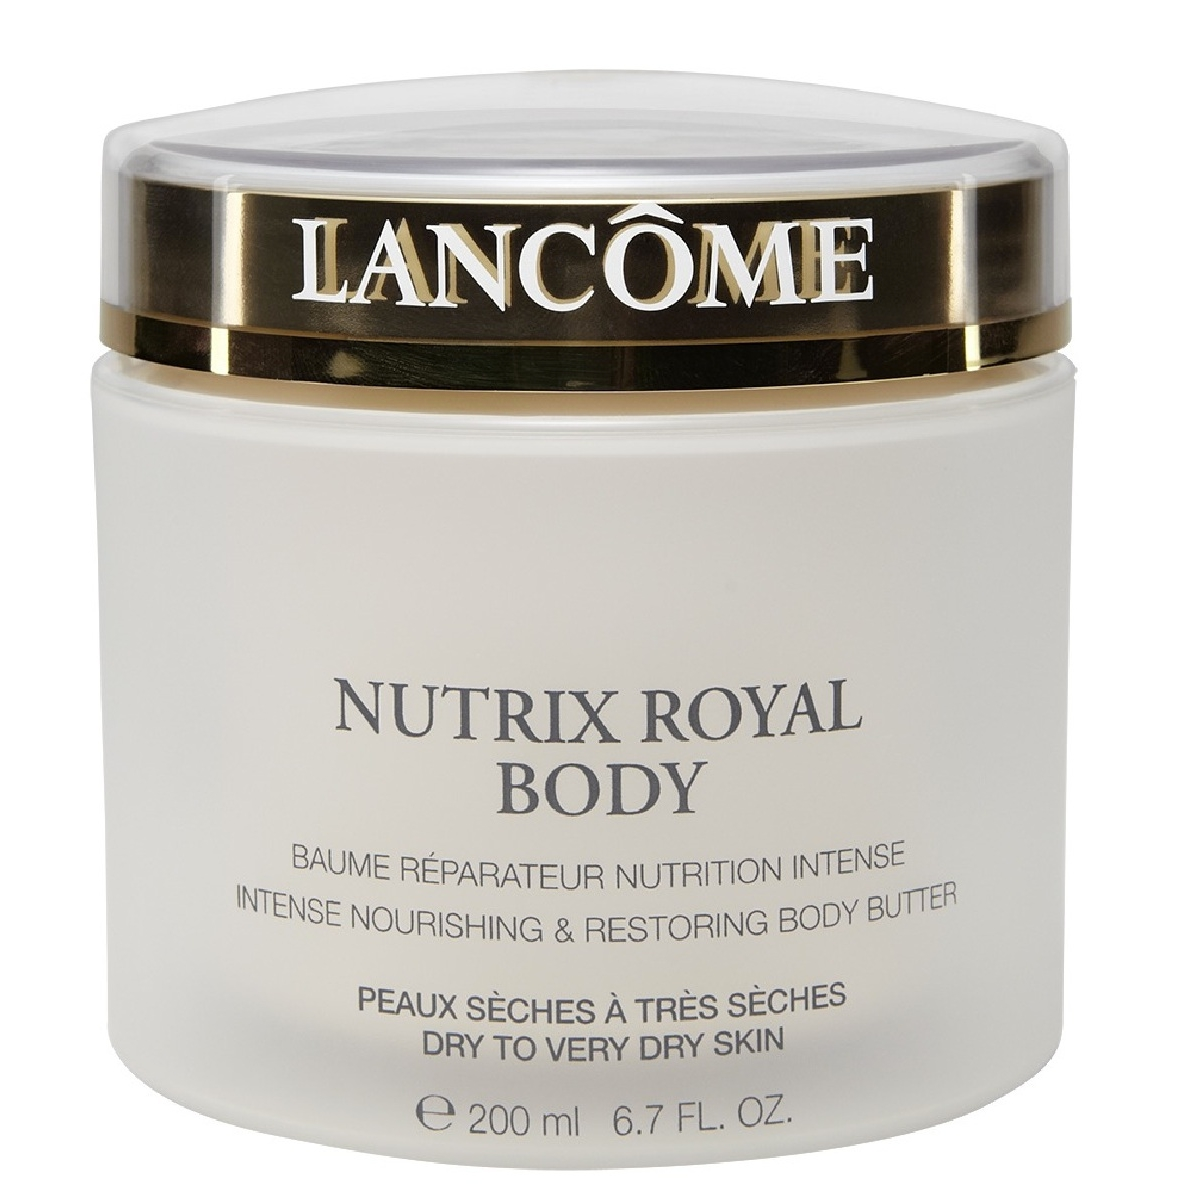 Lancome Nutrix Royal Body Balsamo Vaso 200ml